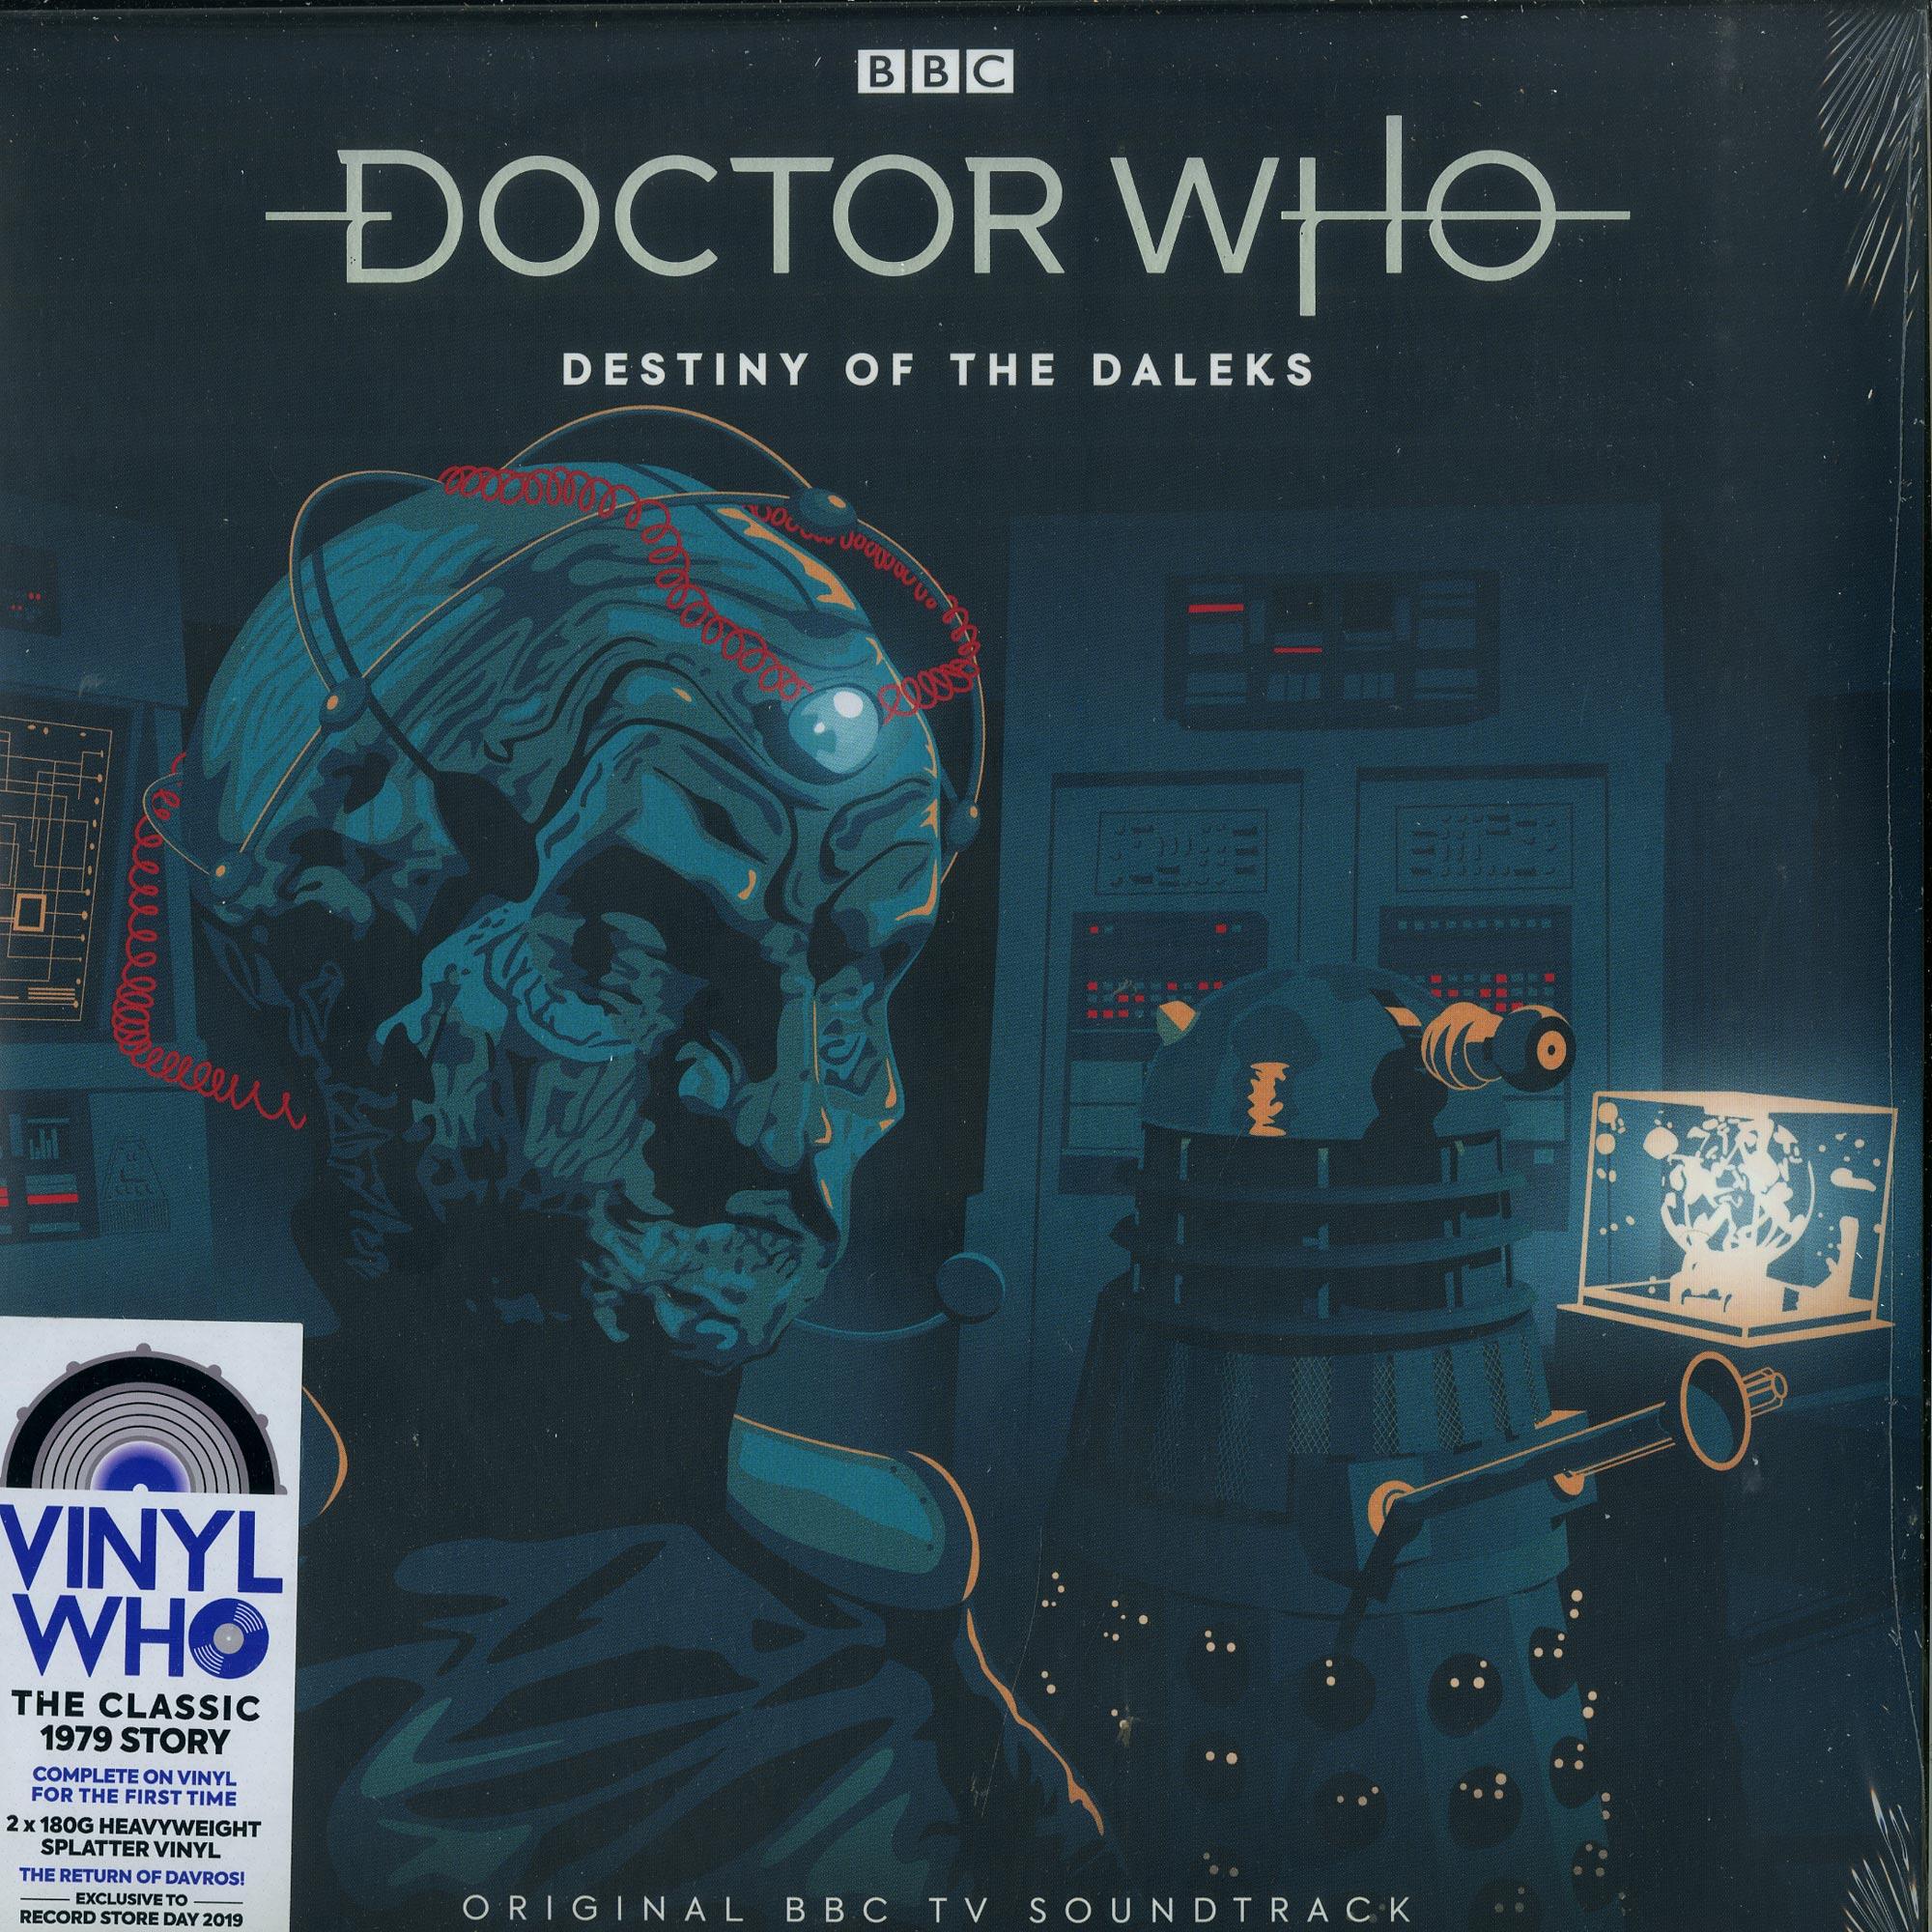 Doctor Who - DESTINY OF THE DALEKS